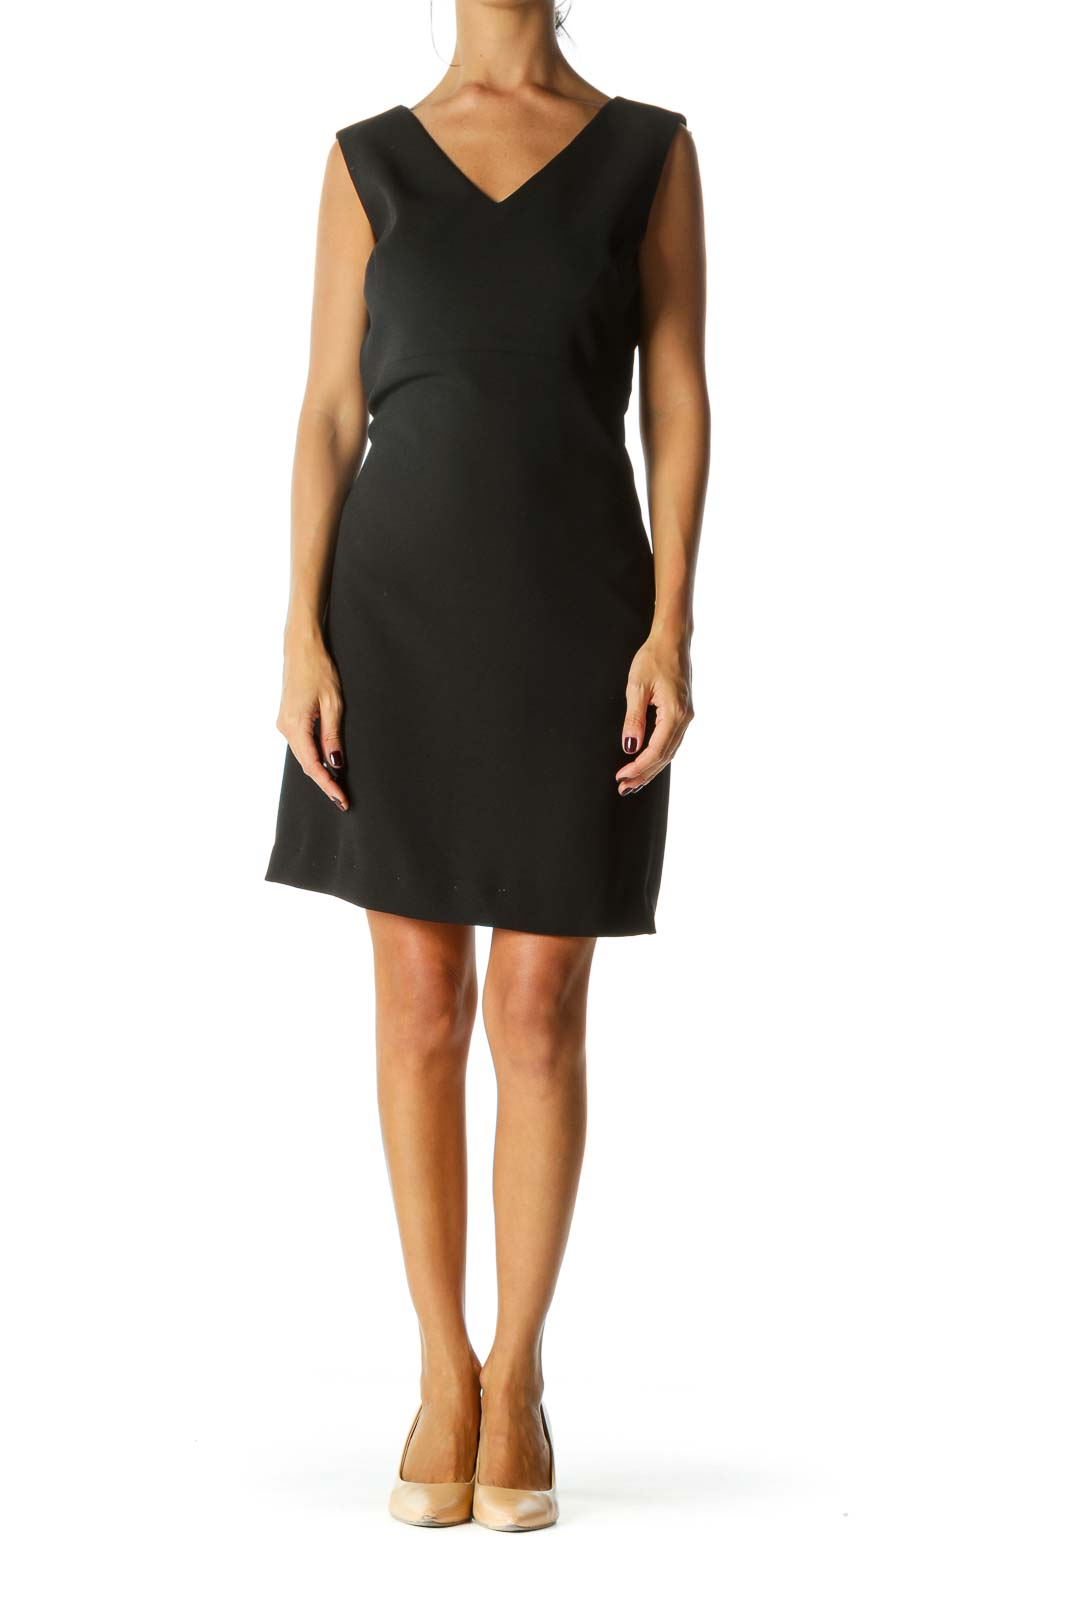 Black Slip Working Dress